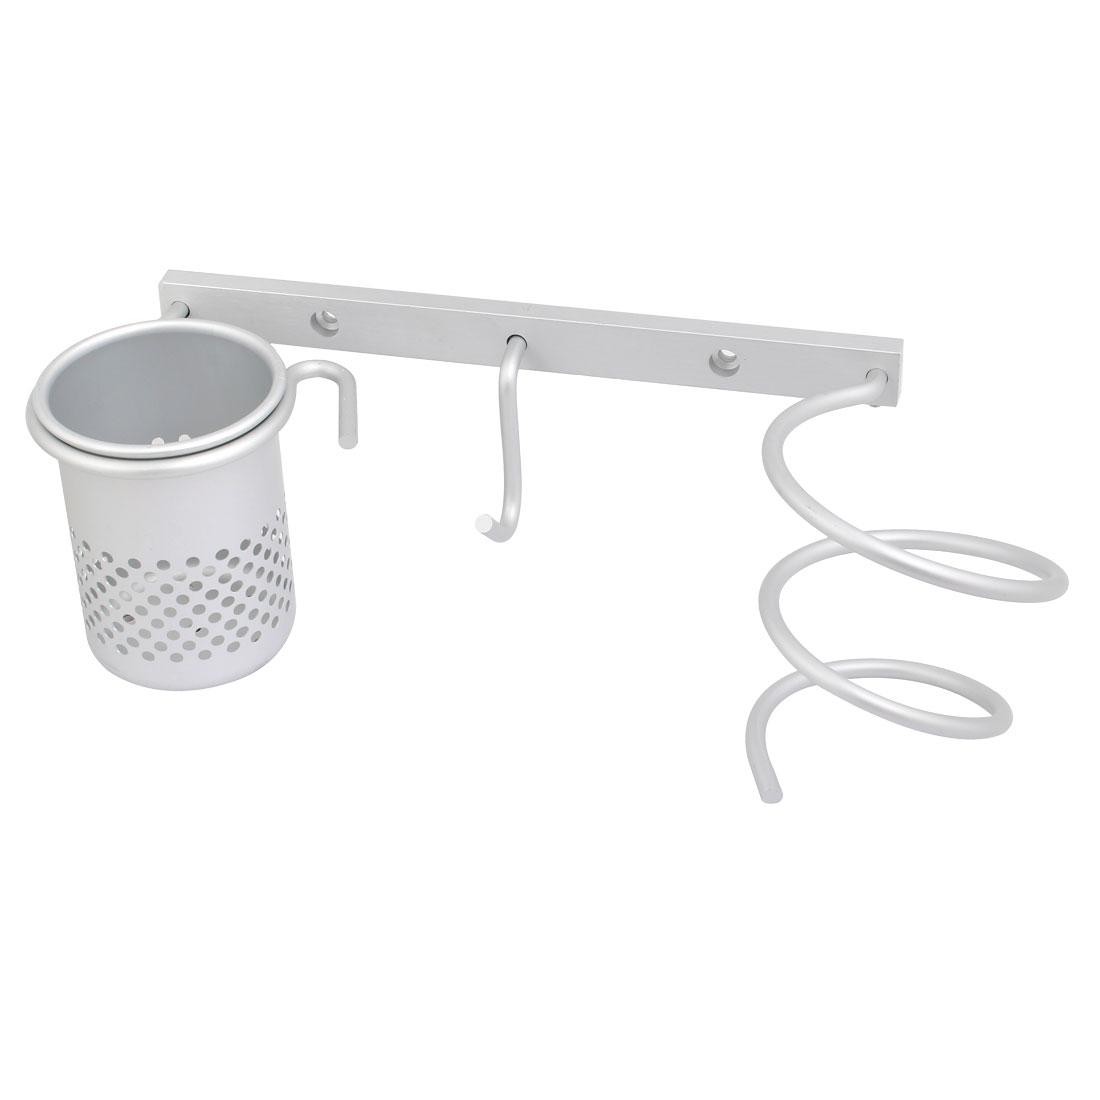 Aluminum Wall Mount Spring Style Hair Dryer Holder Storage Rack Set Silver Tone